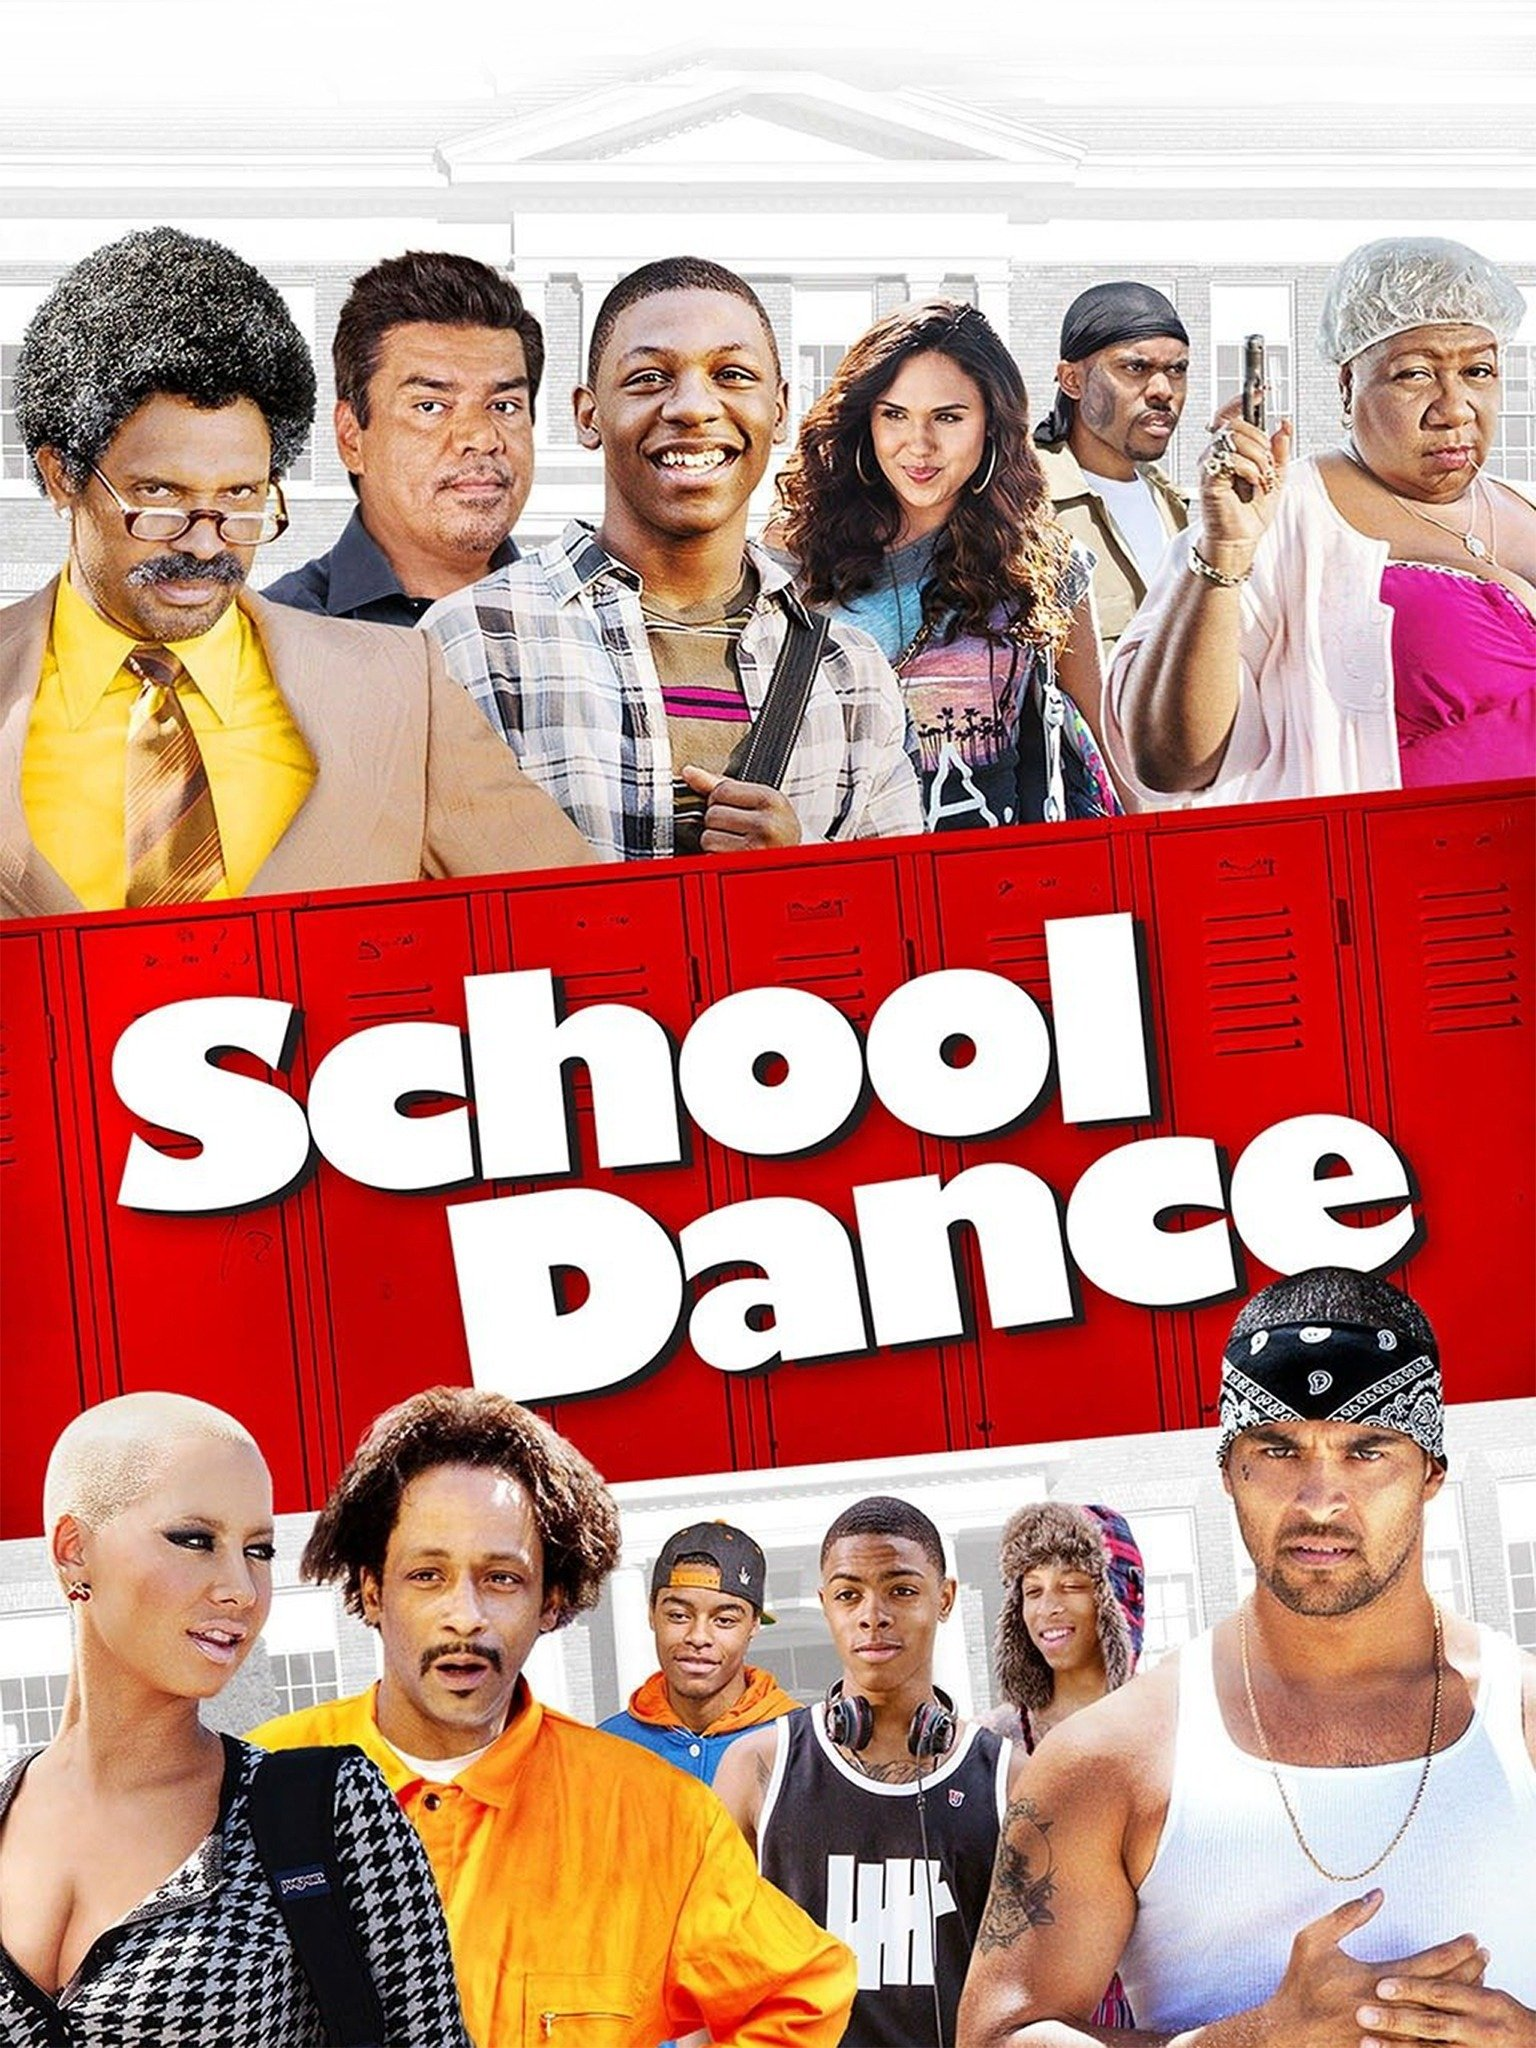 School Dance 2014 Rotten Tomatoes